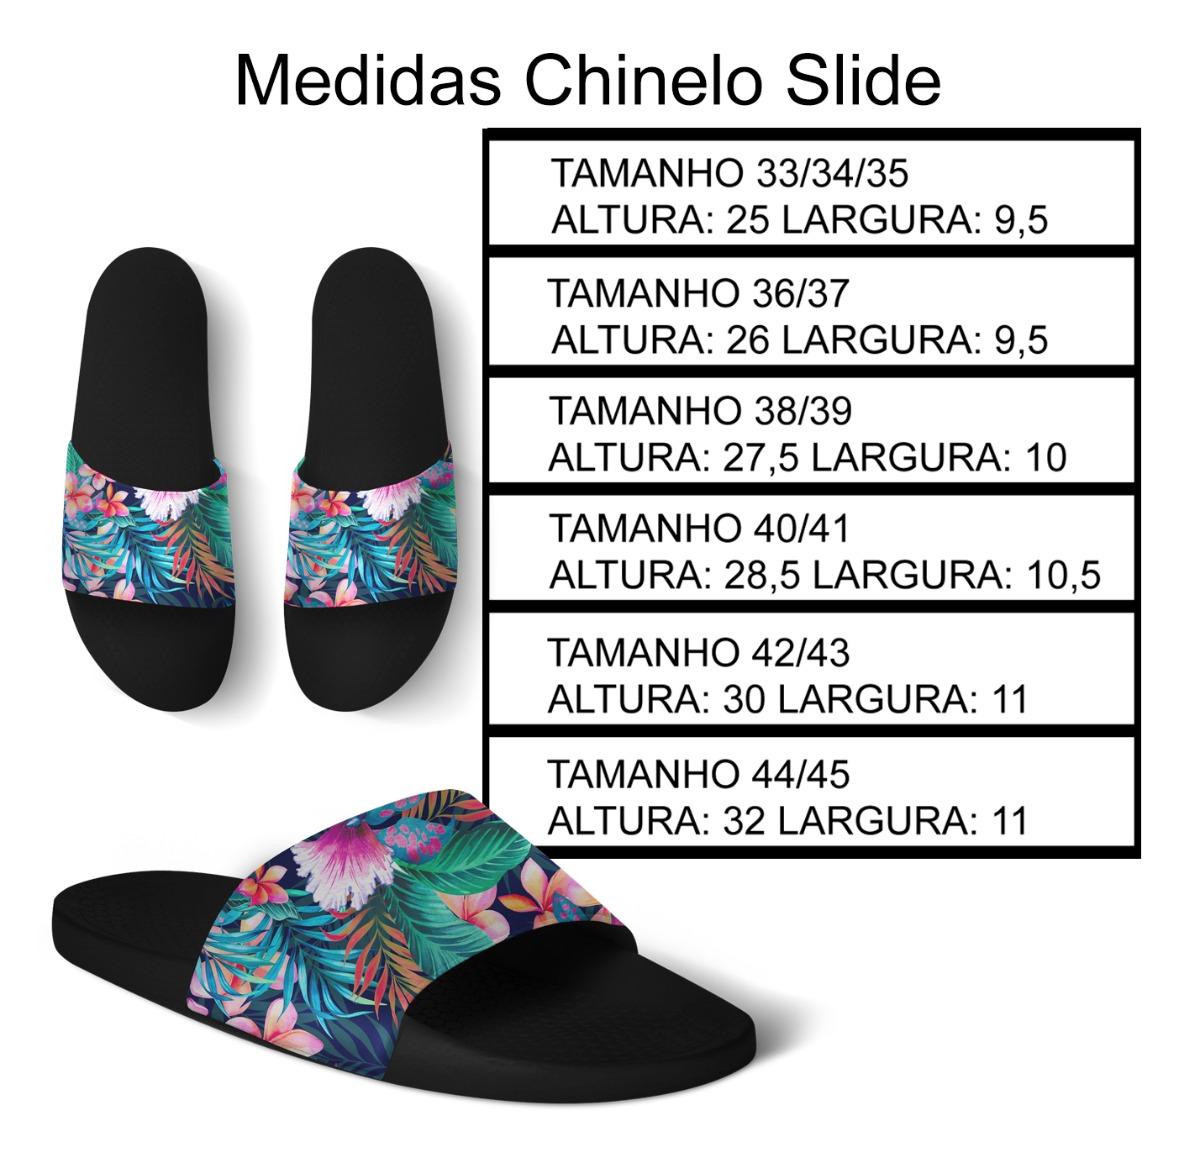 Chinelo Slide Beach Gucci Tigre Benassi Top Promoção!!! - R  63,70 ... fd96f6ad9a